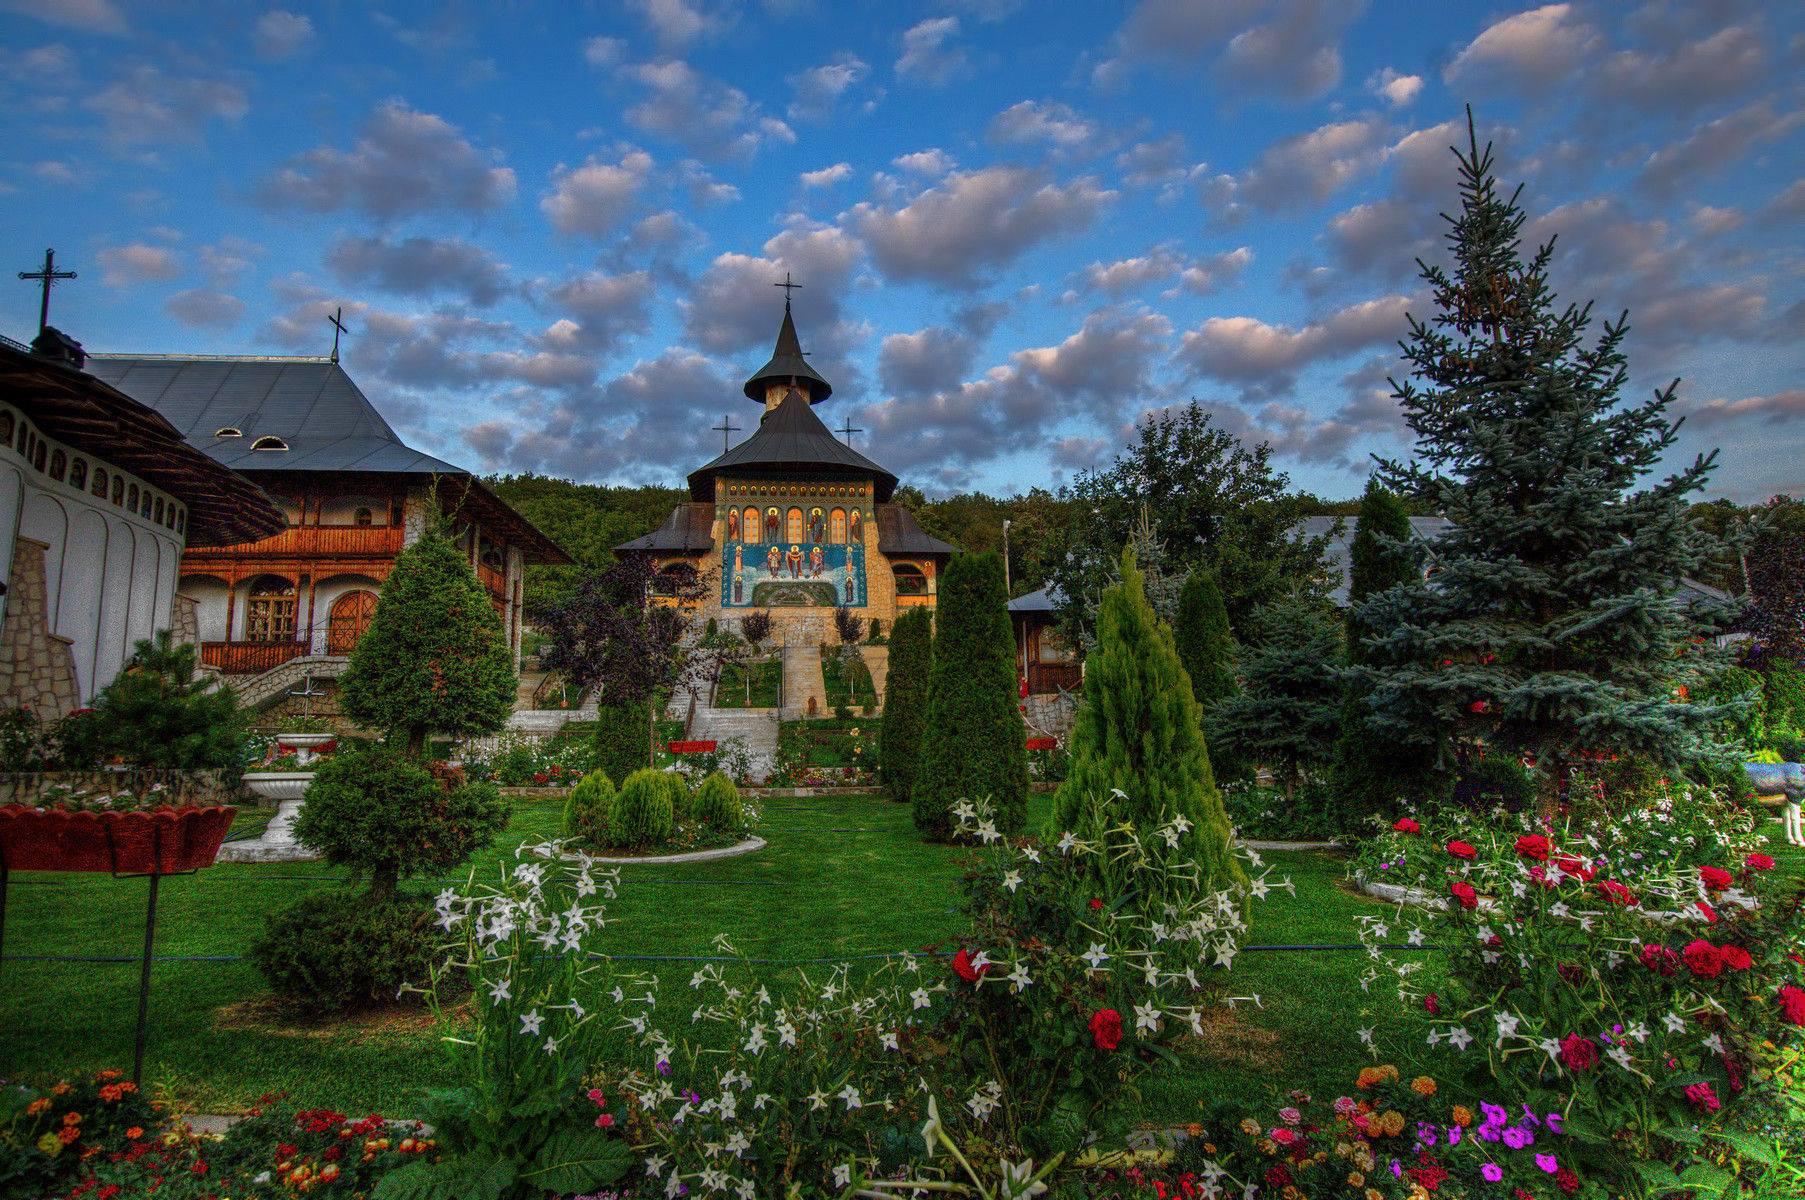 Mănăstirea Bujoreni, Comuna Zorleni, Vaslui